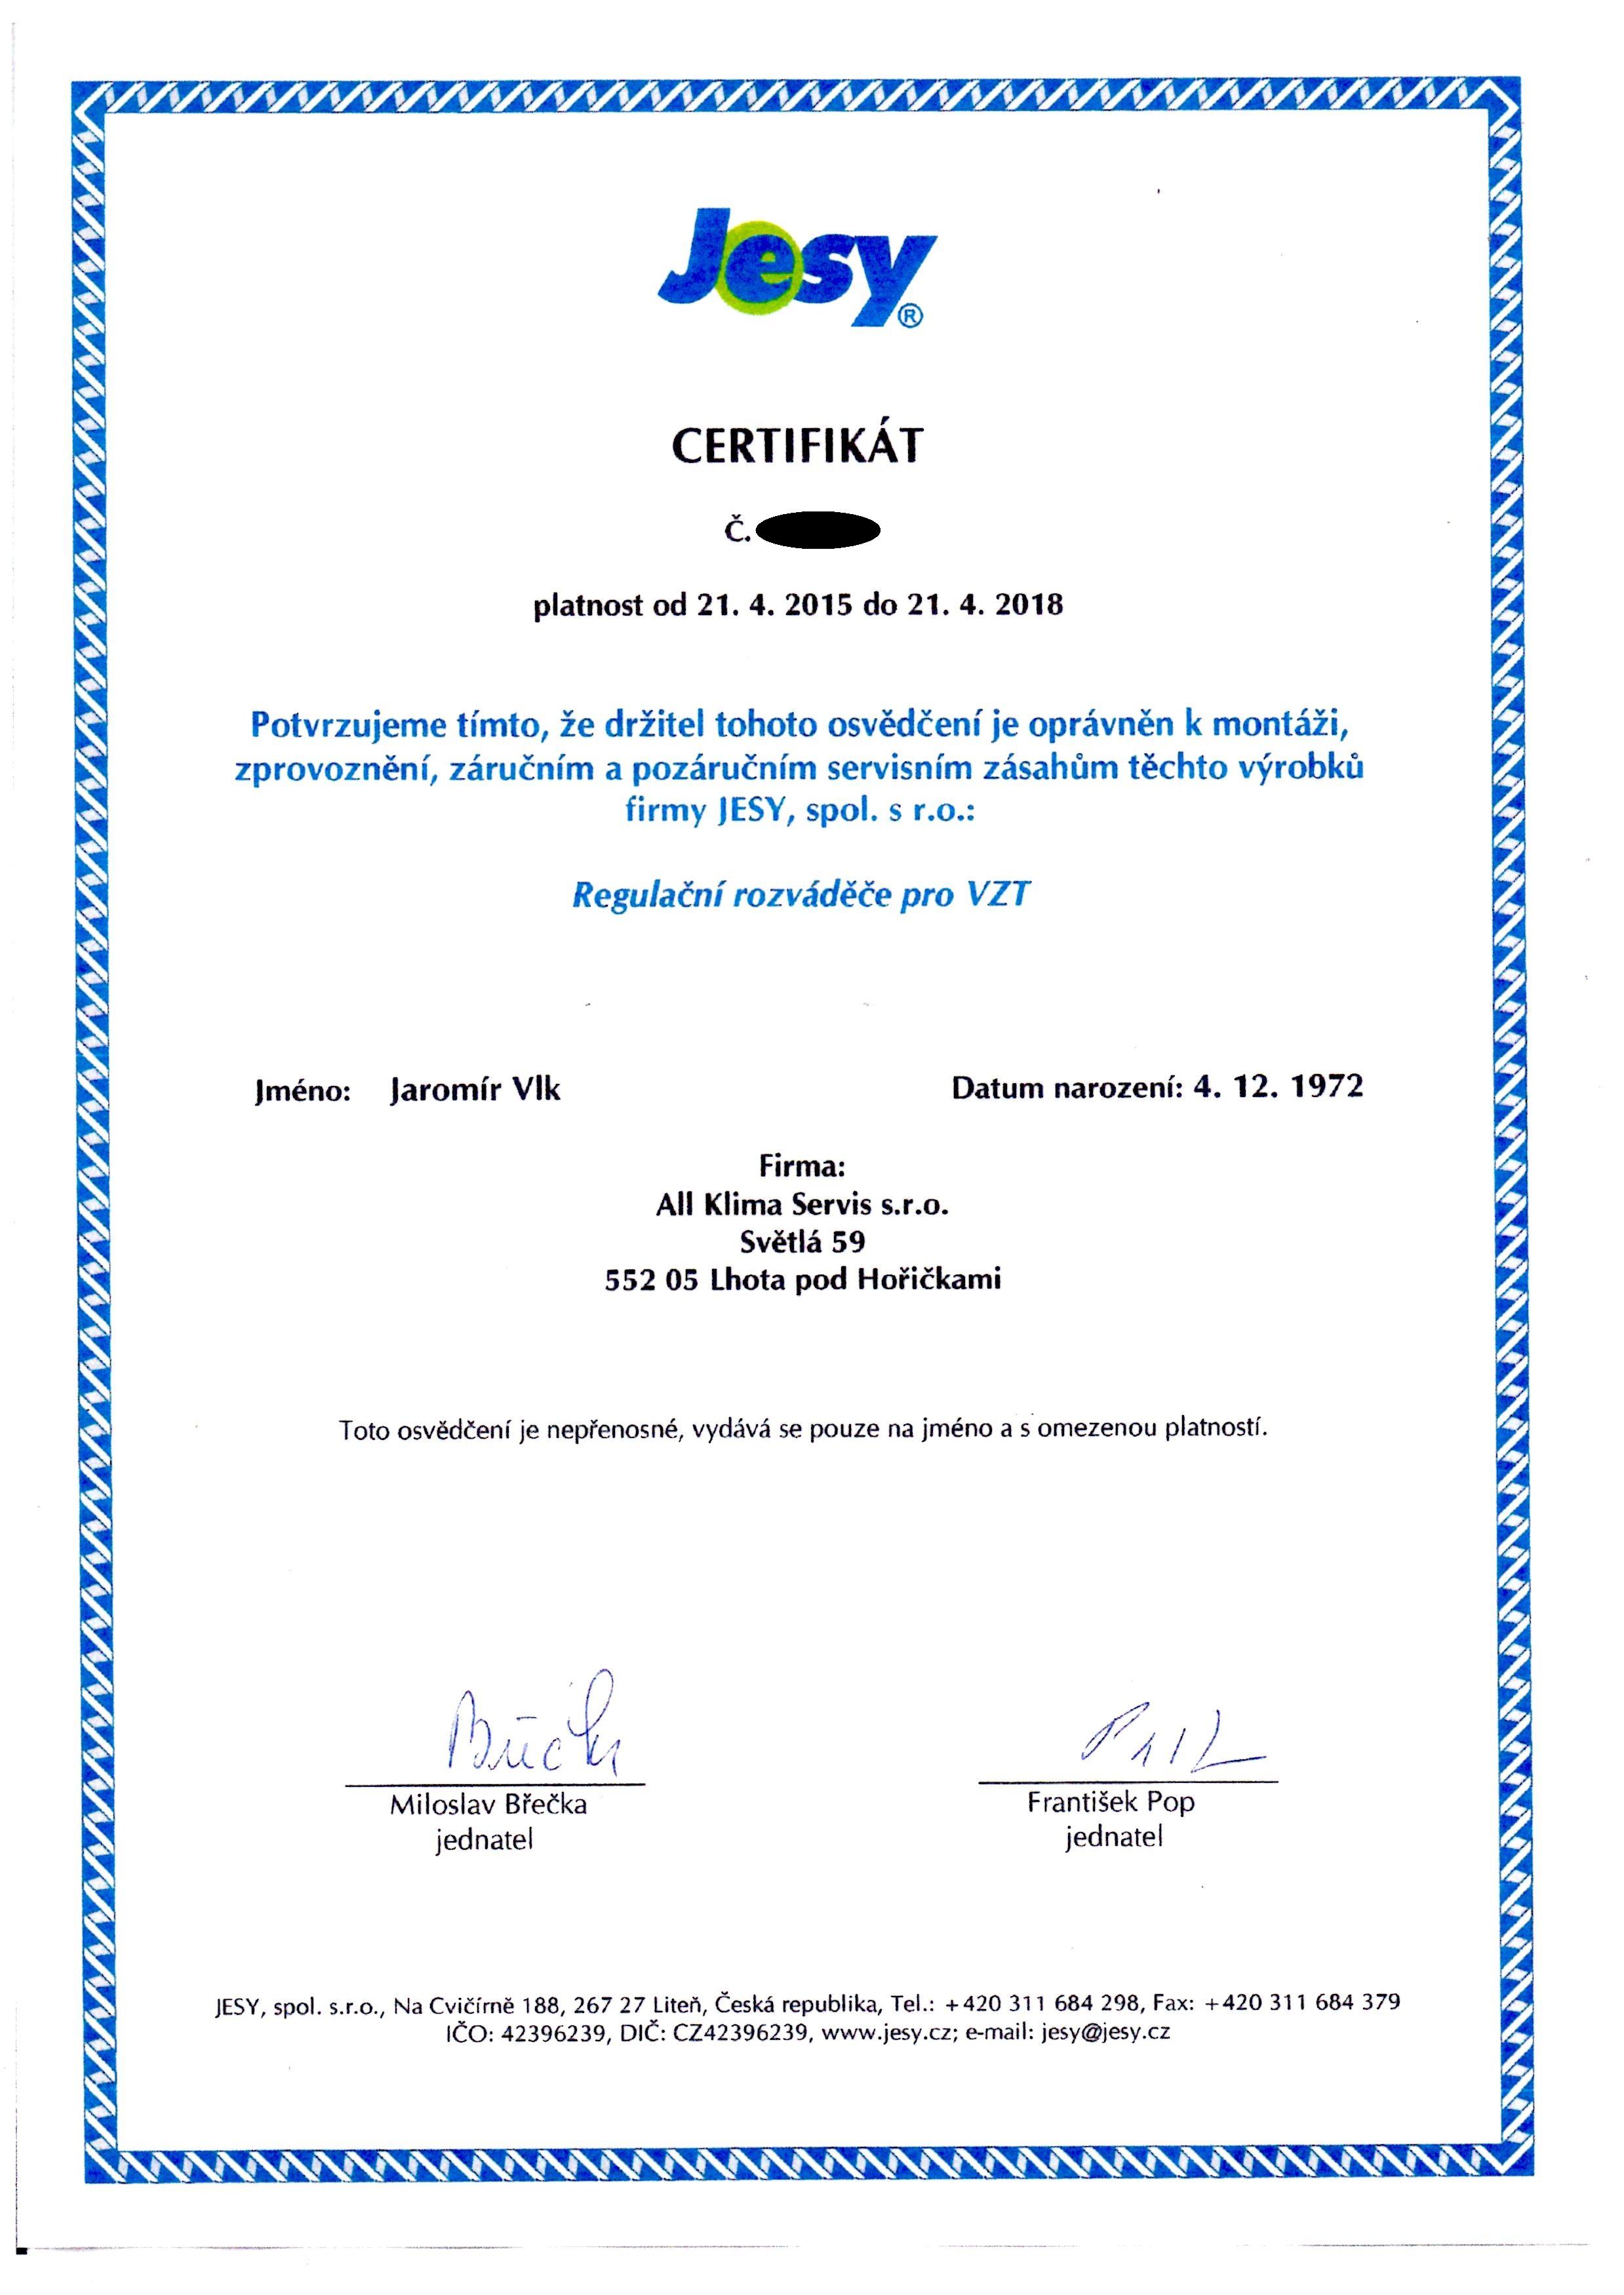 Certifikát JESY, spol. s r.o.